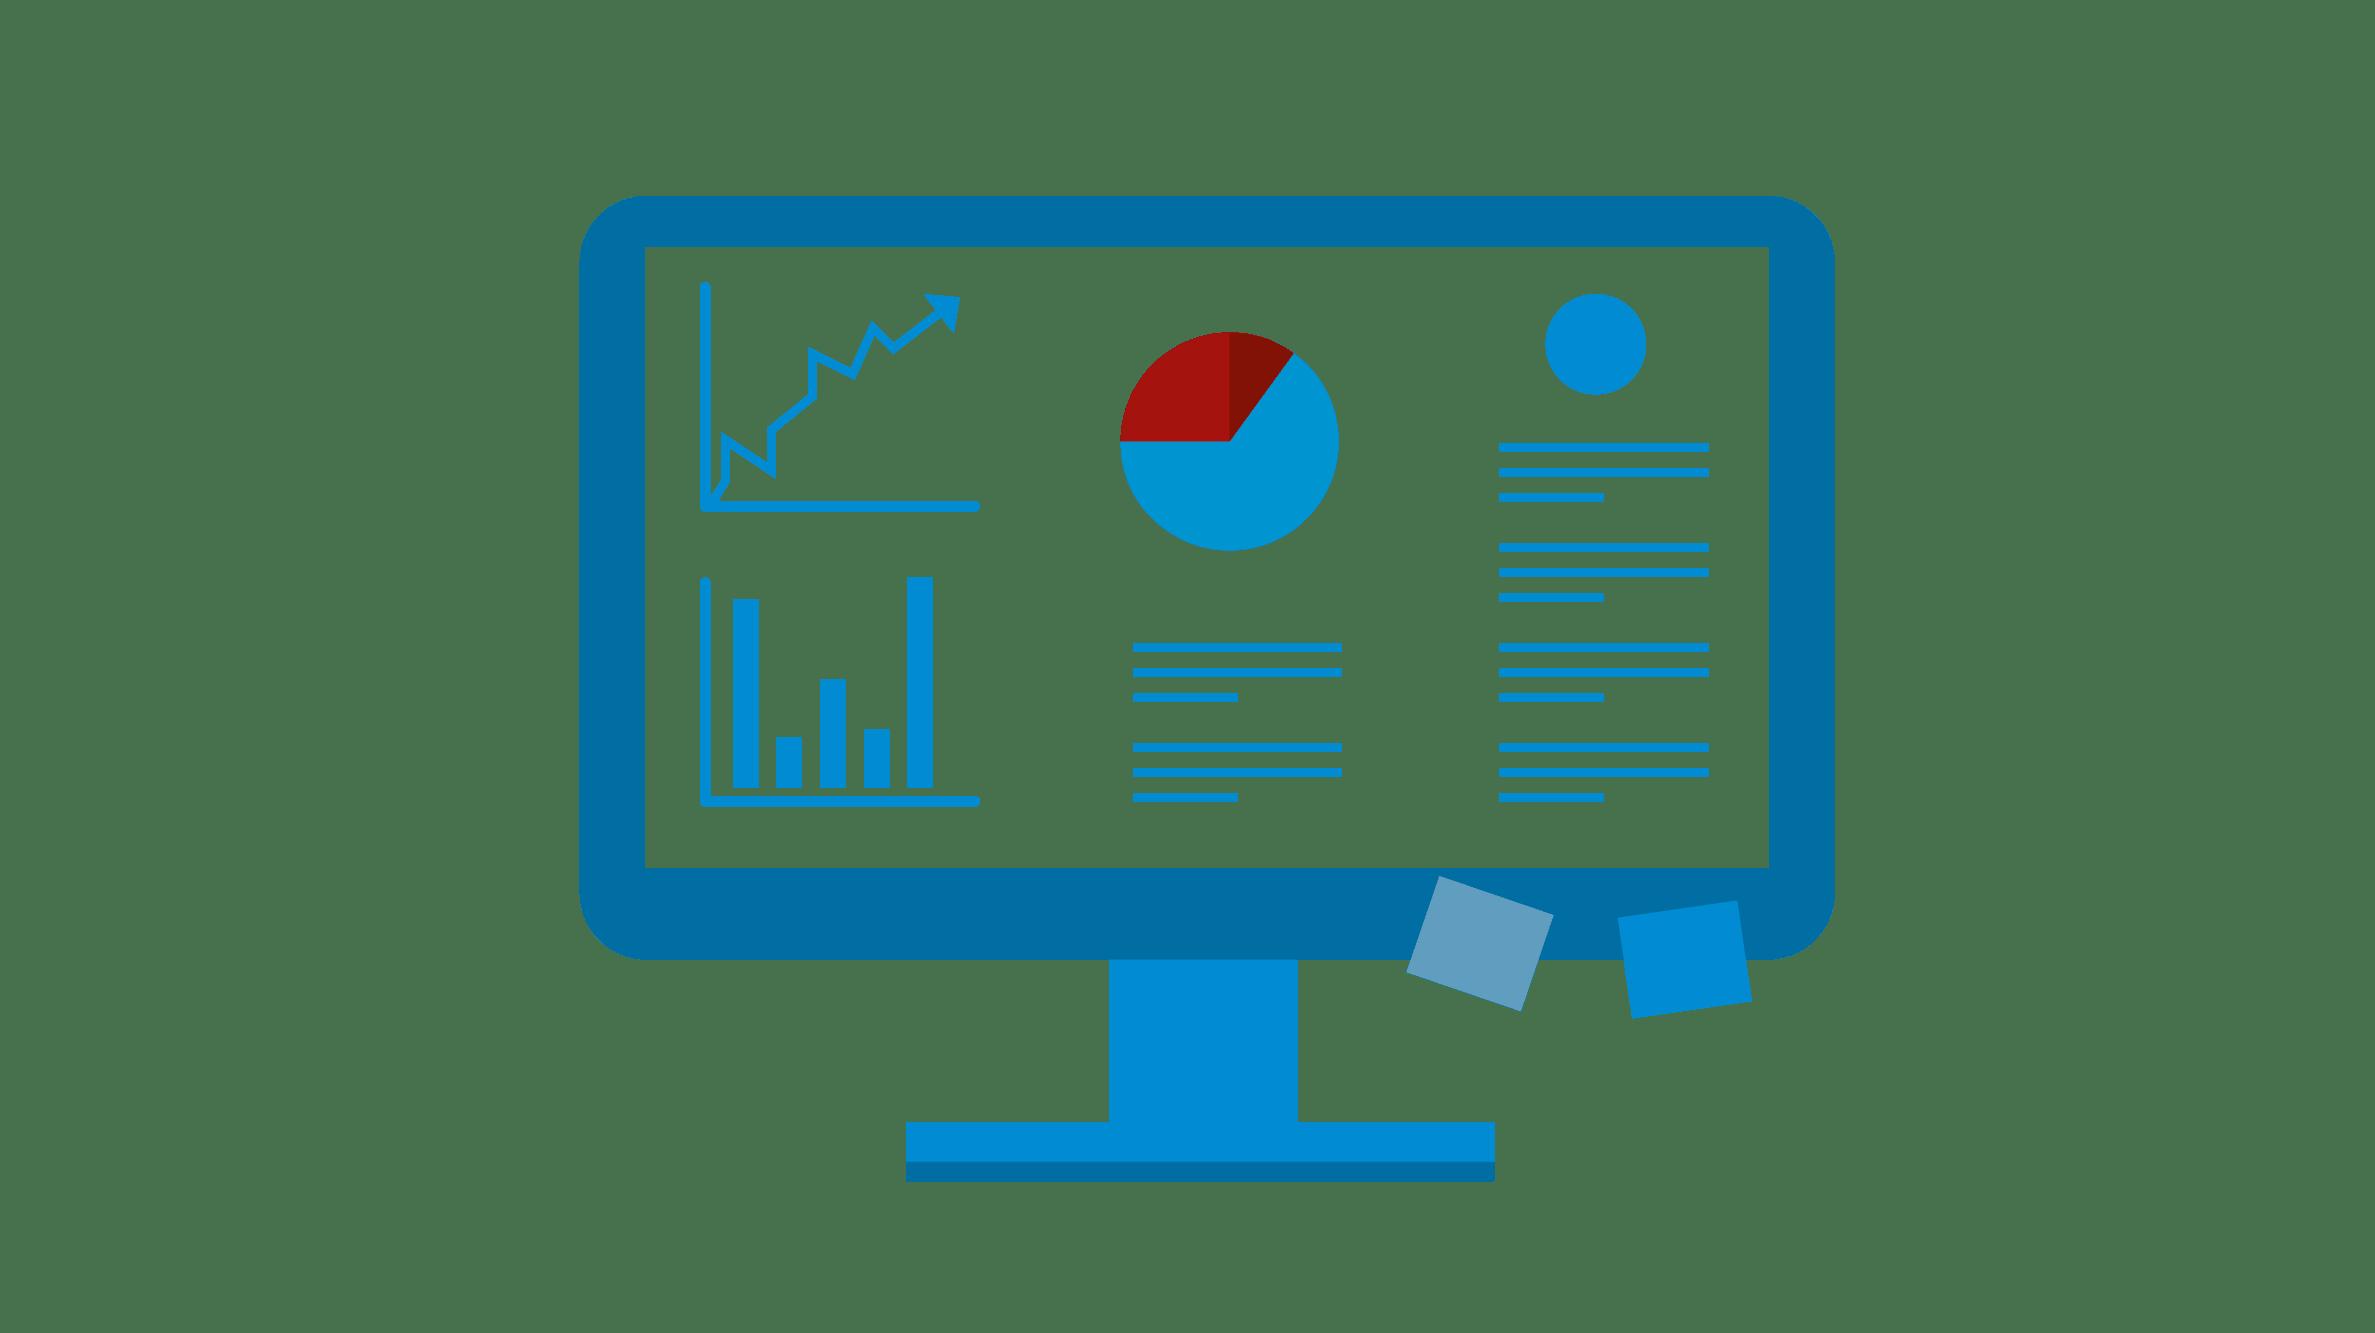 Kostenrechnung_Section_5.png